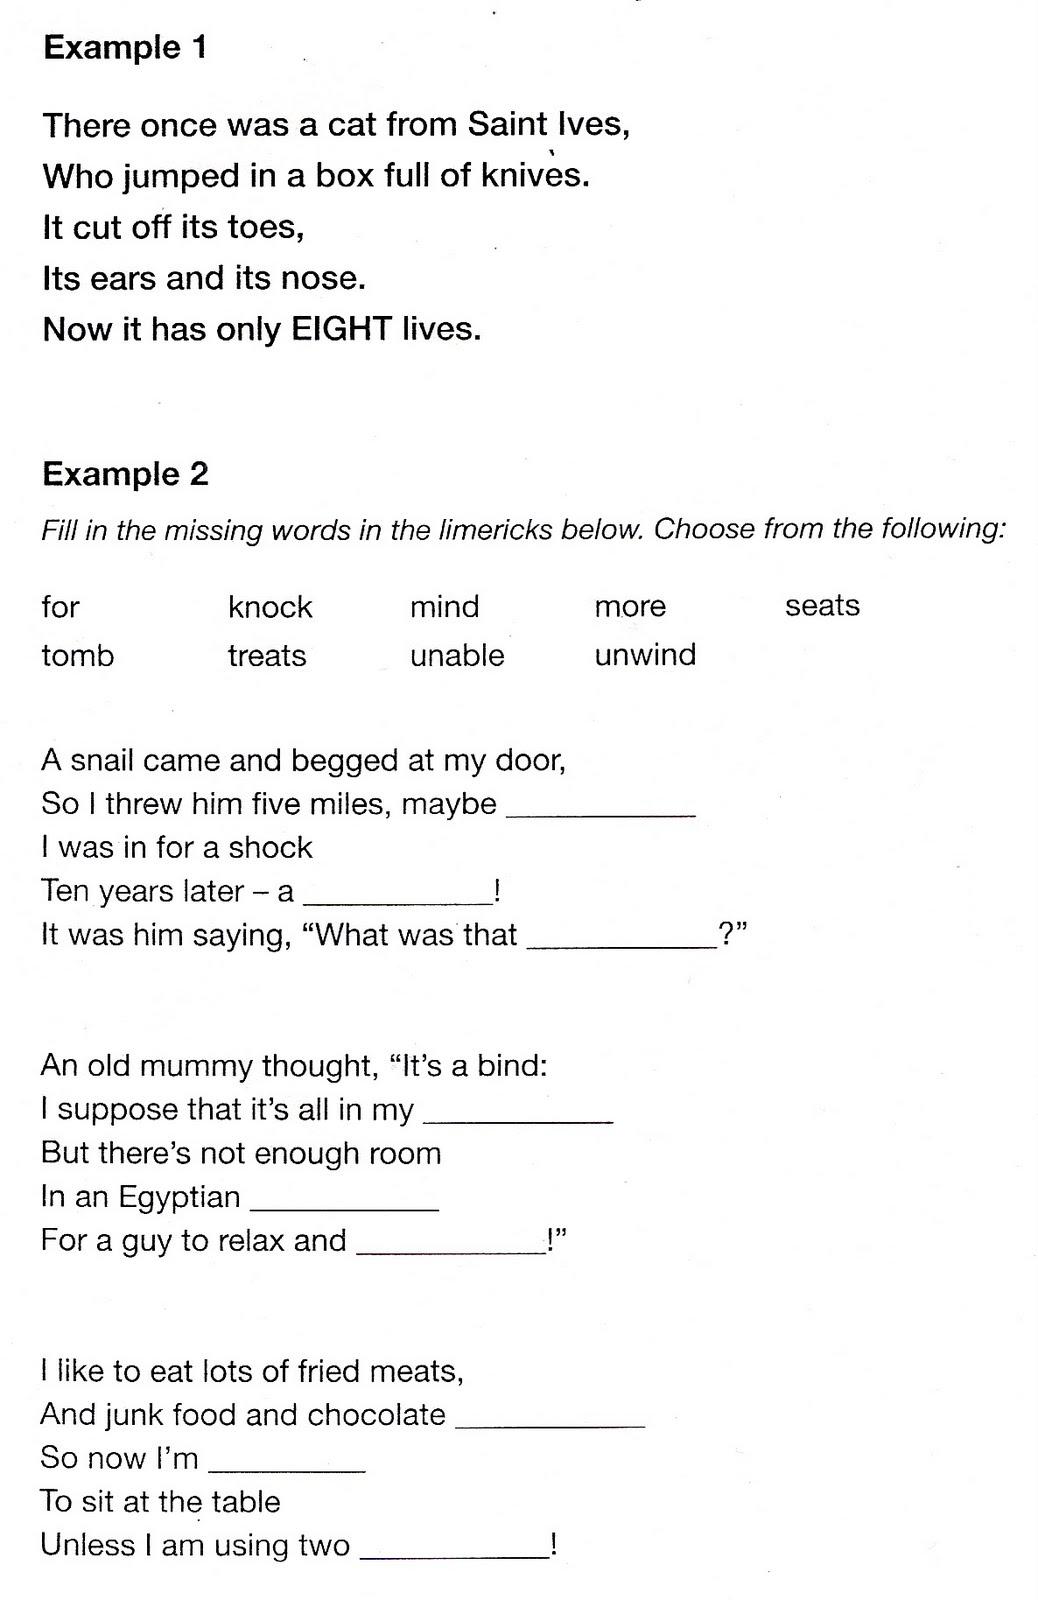 rhyme scheme | we(often)learnhere